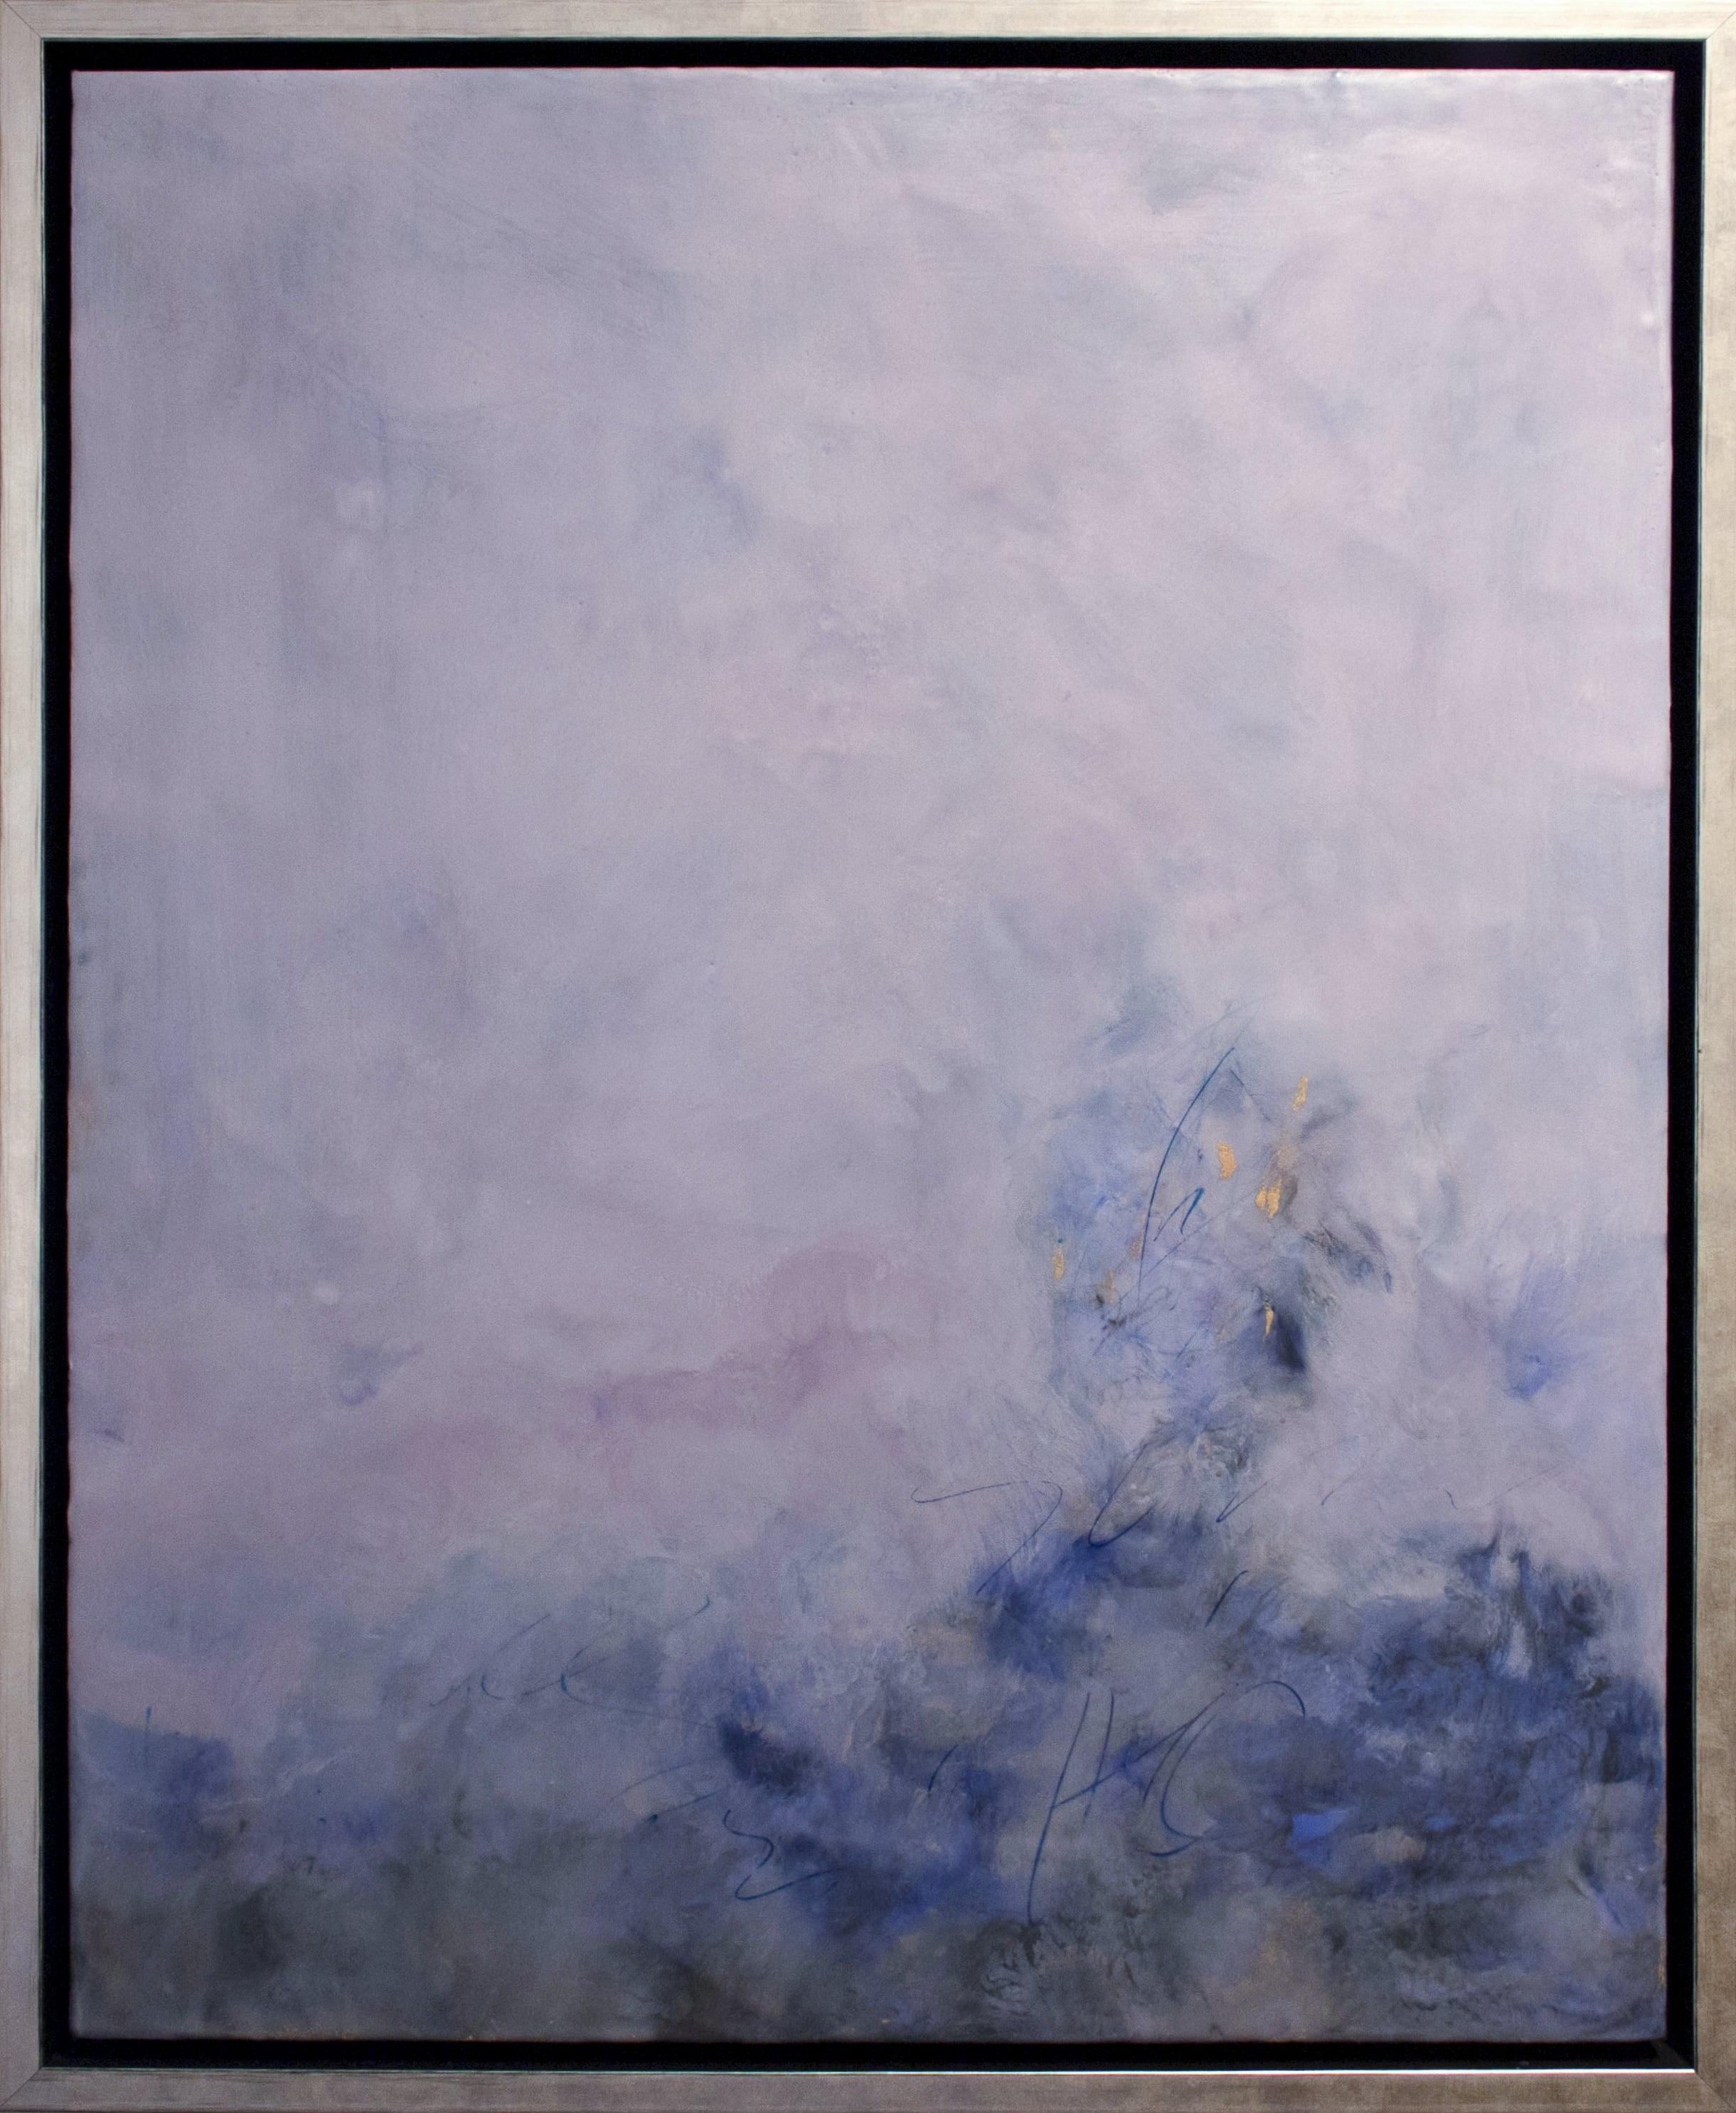 """Something Worth Remembering #3"" by Pamela Gibson, Encaustic Painting, 2019"